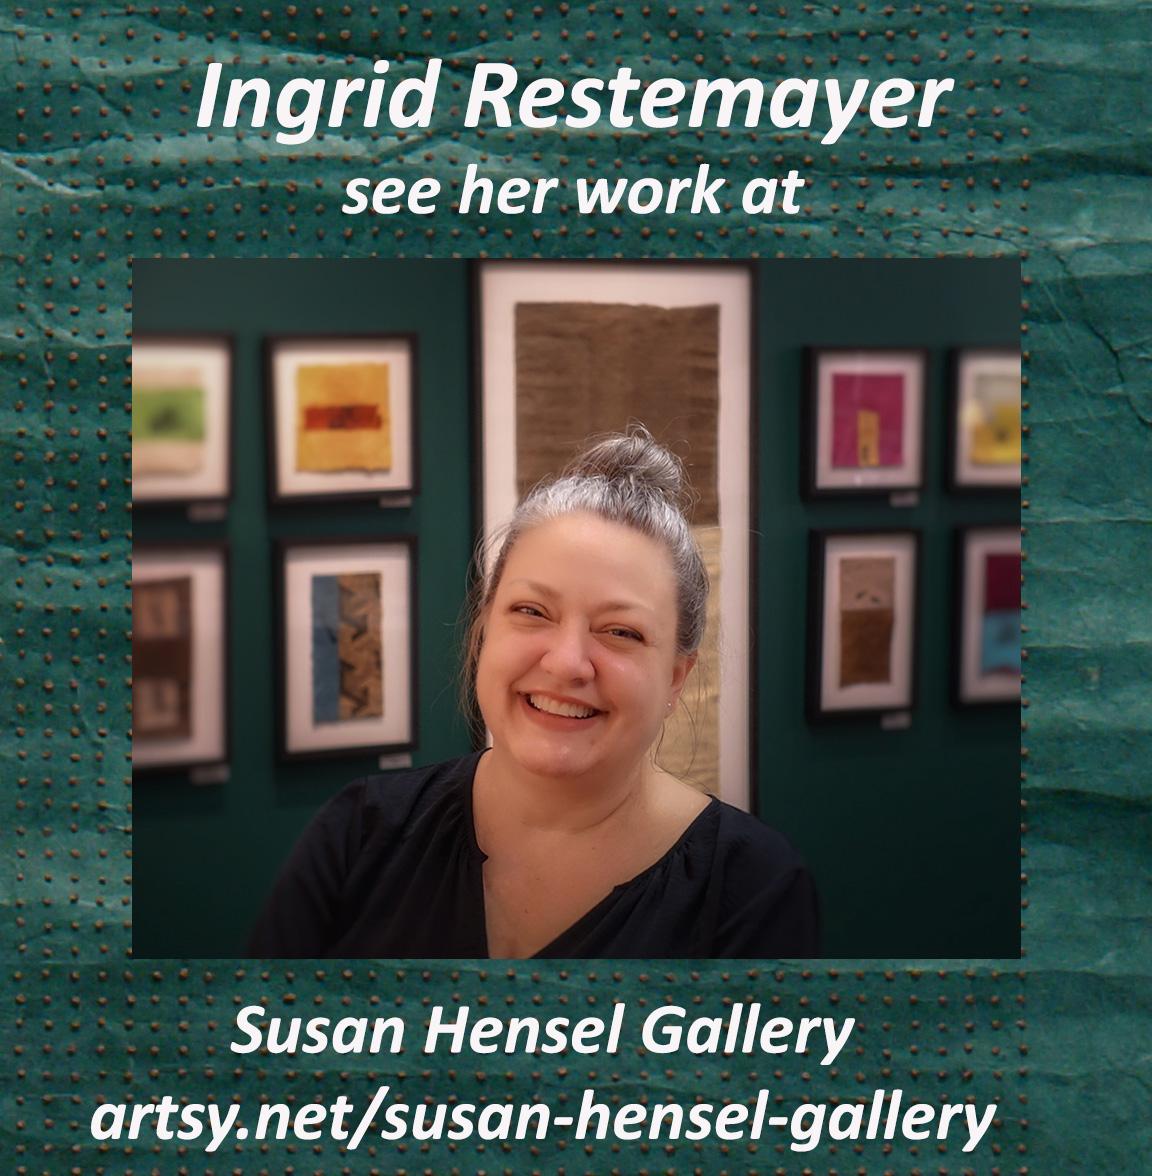 Ingrid Restemayer